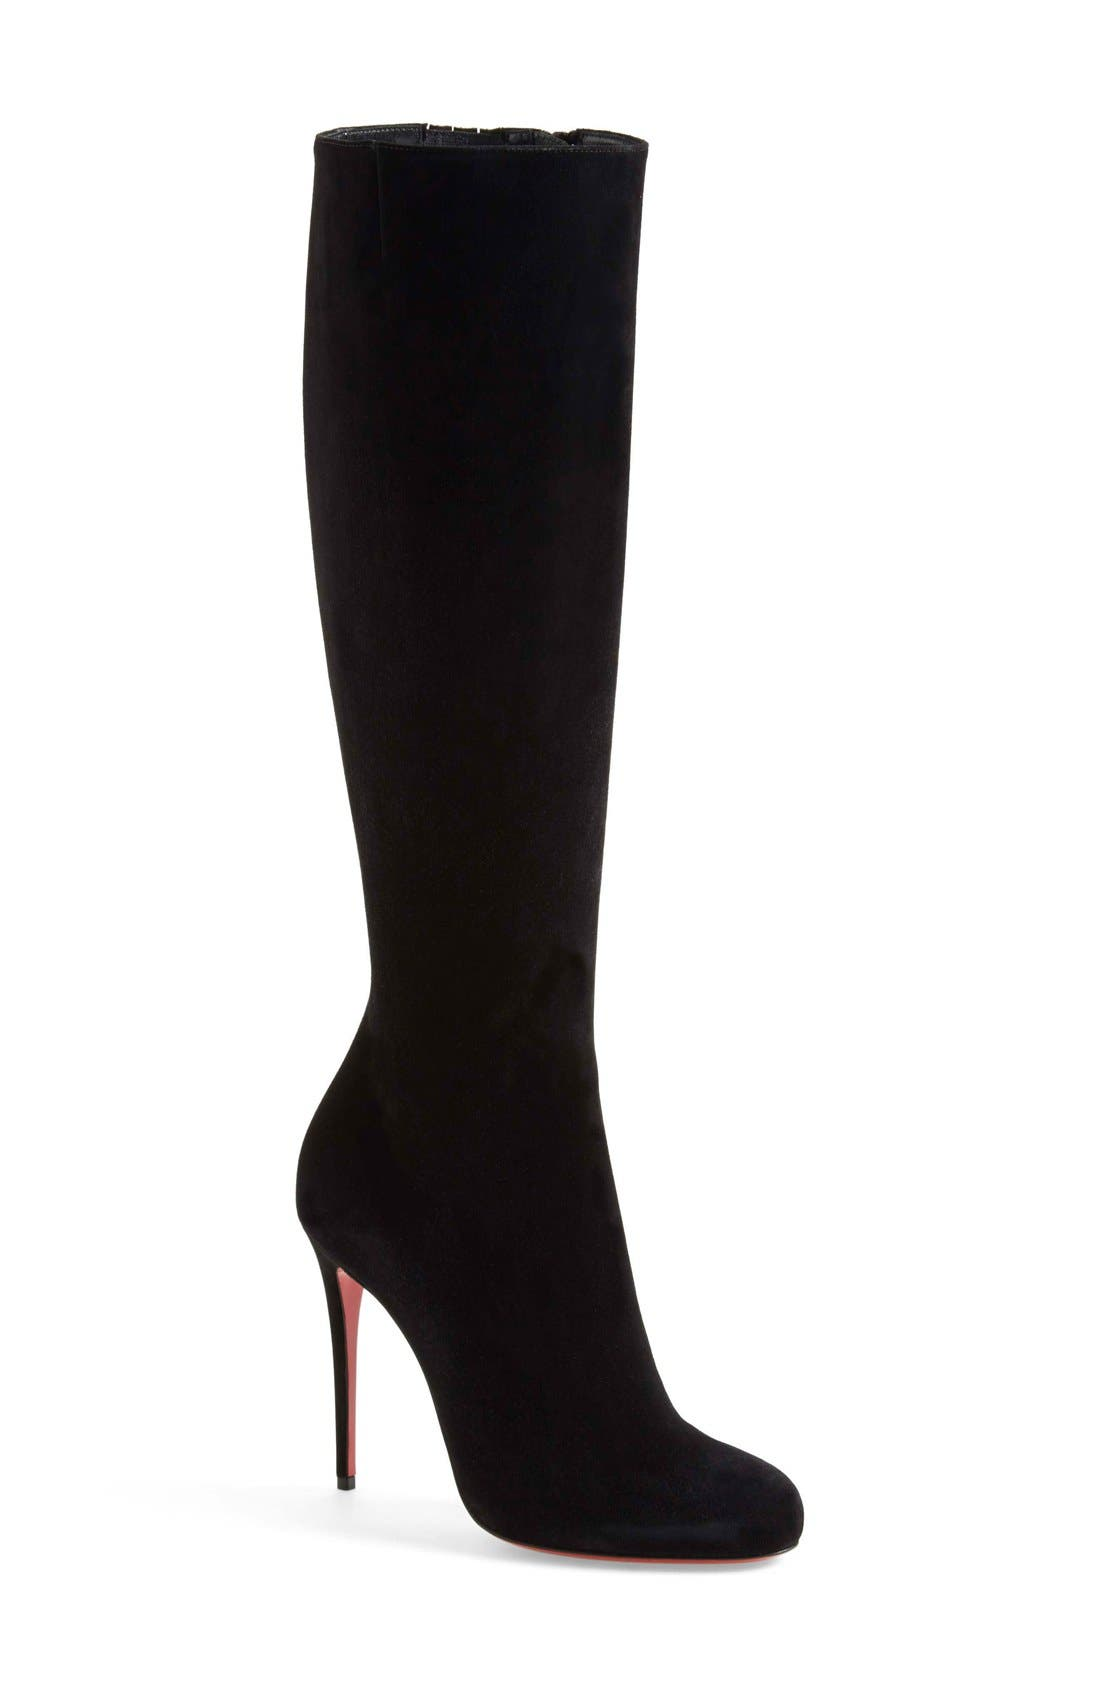 Main Image - Christian Louboutin 'Fifi' Tall Boot